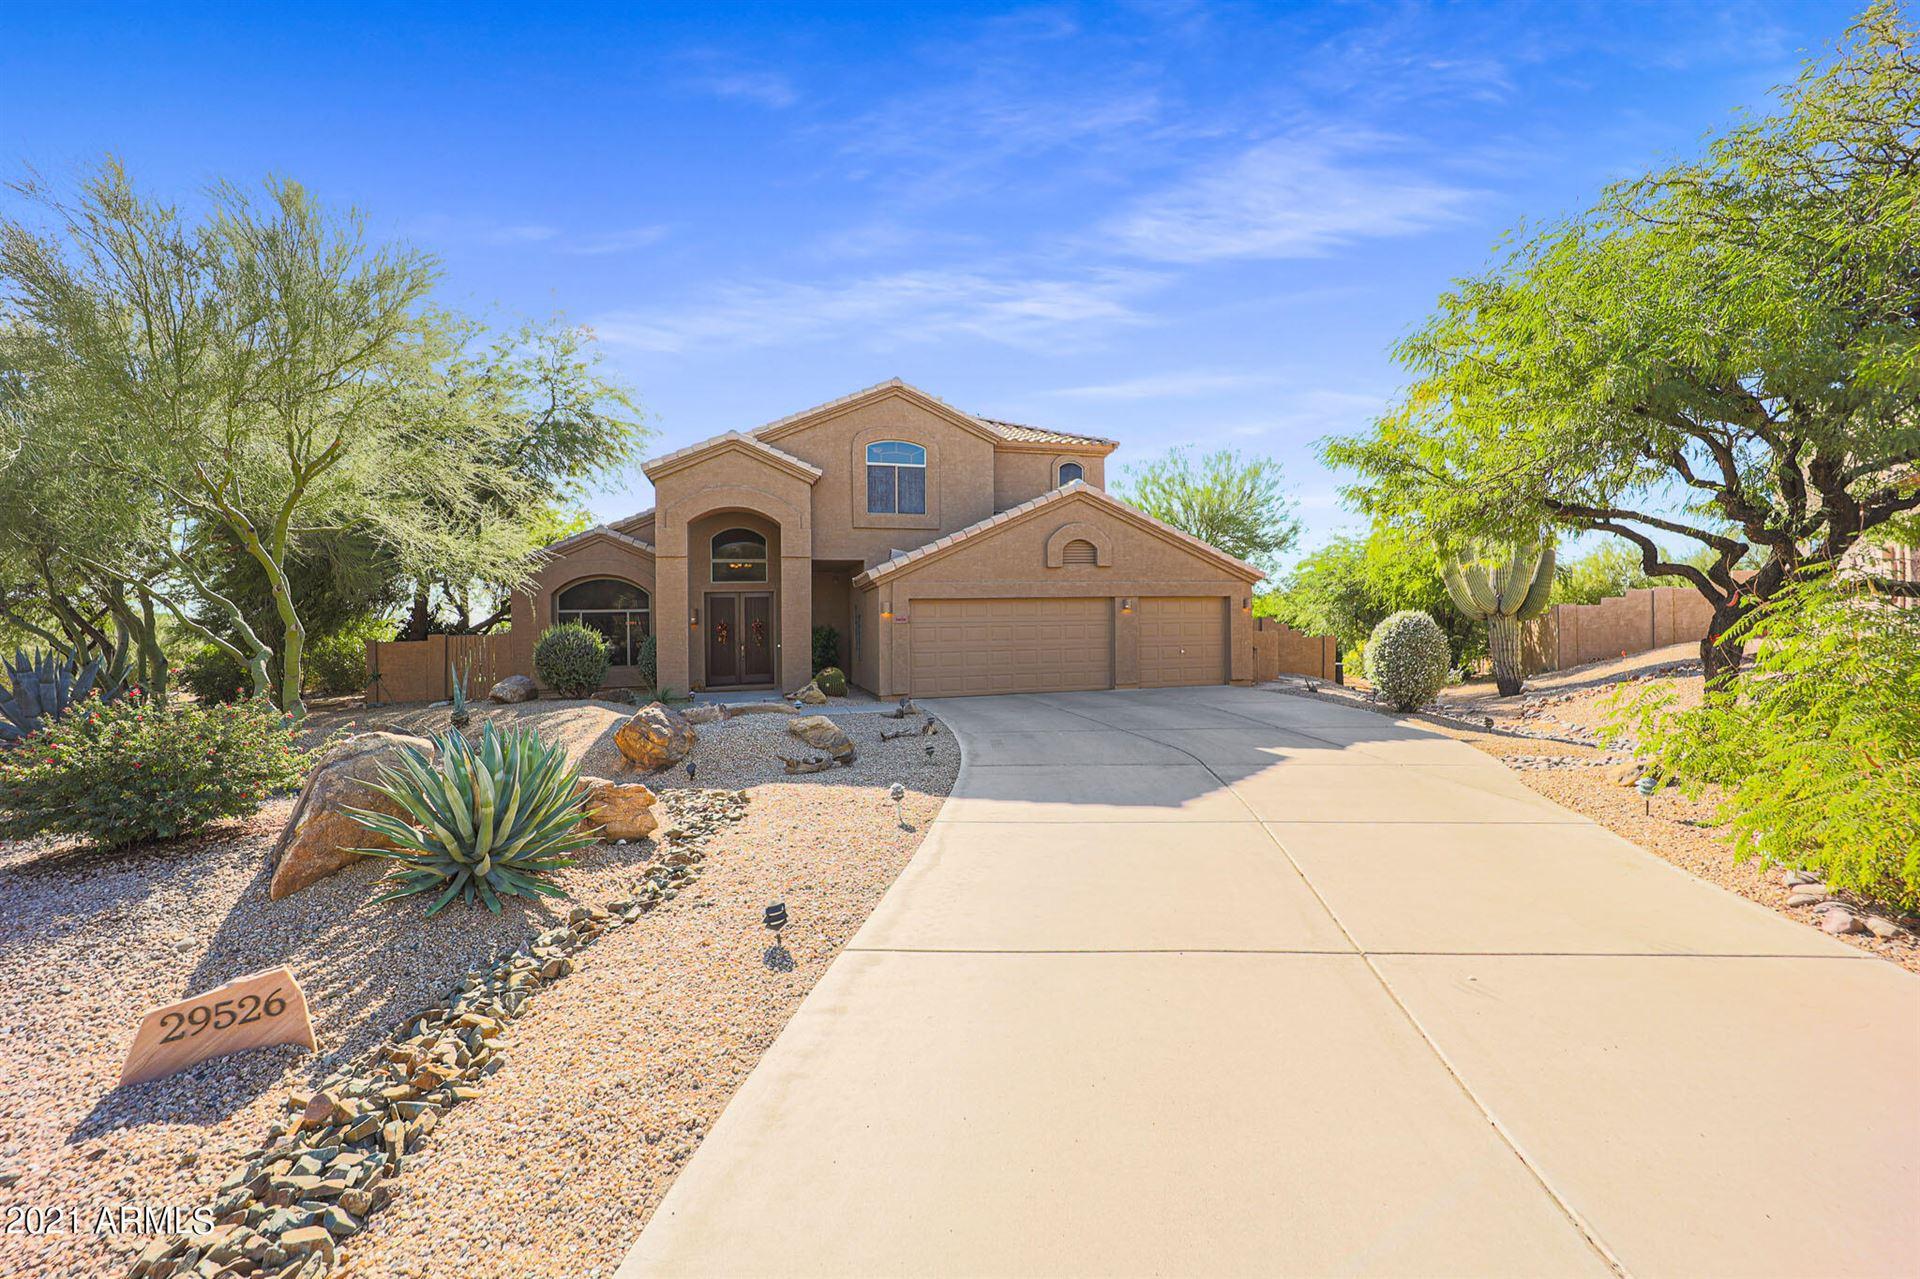 Photo of 29526 N 67TH Street, Scottsdale, AZ 85266 (MLS # 6307736)